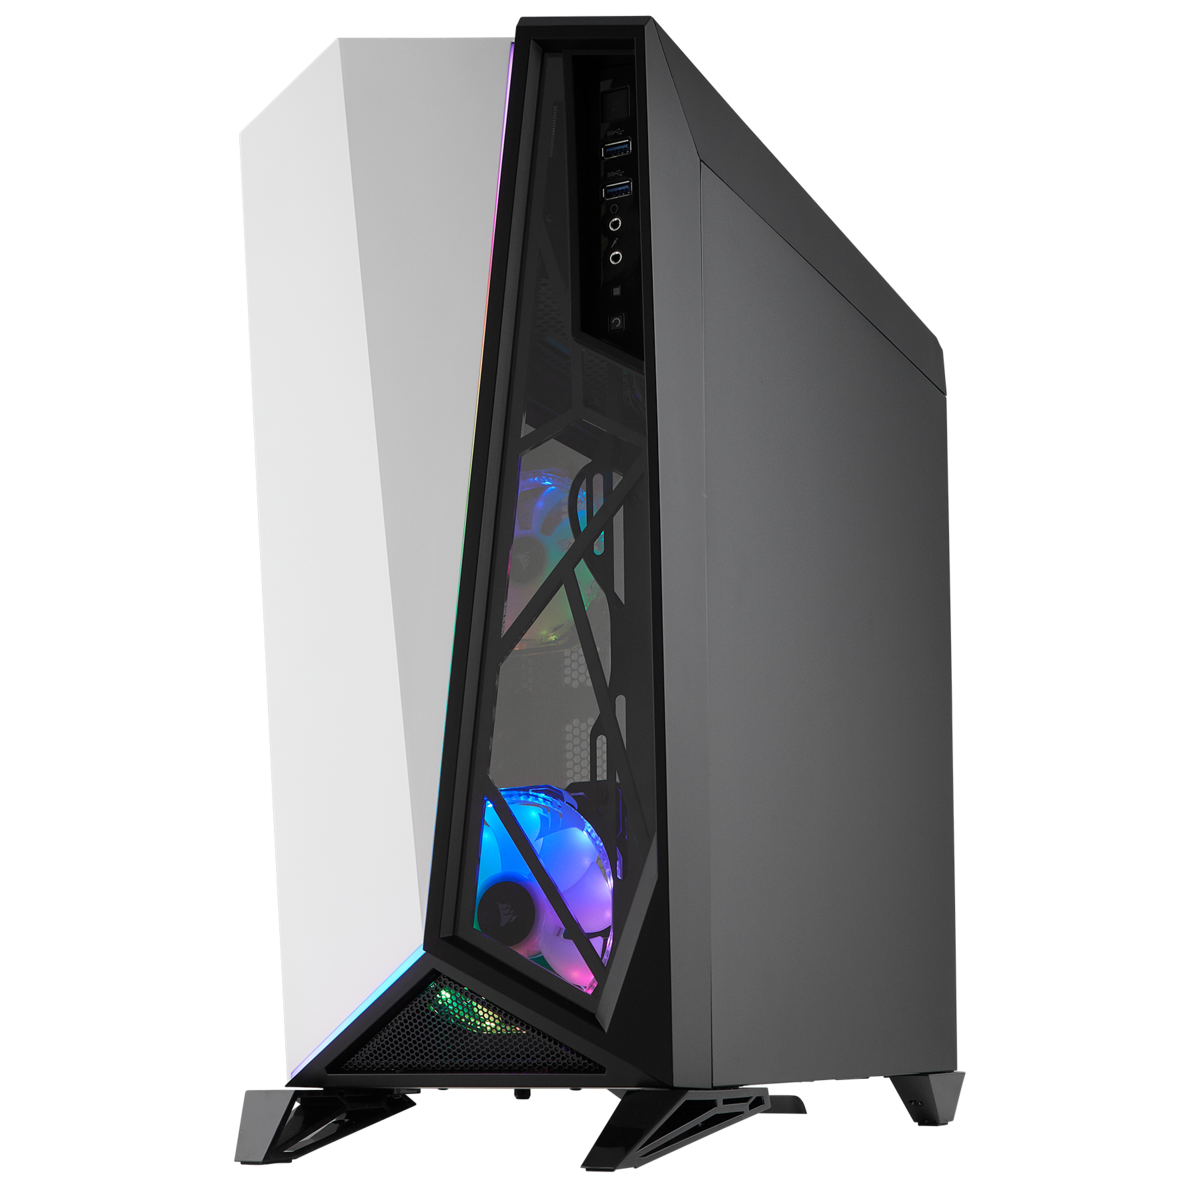 SPEC OMEGA WHITE RGB - CORSAIR